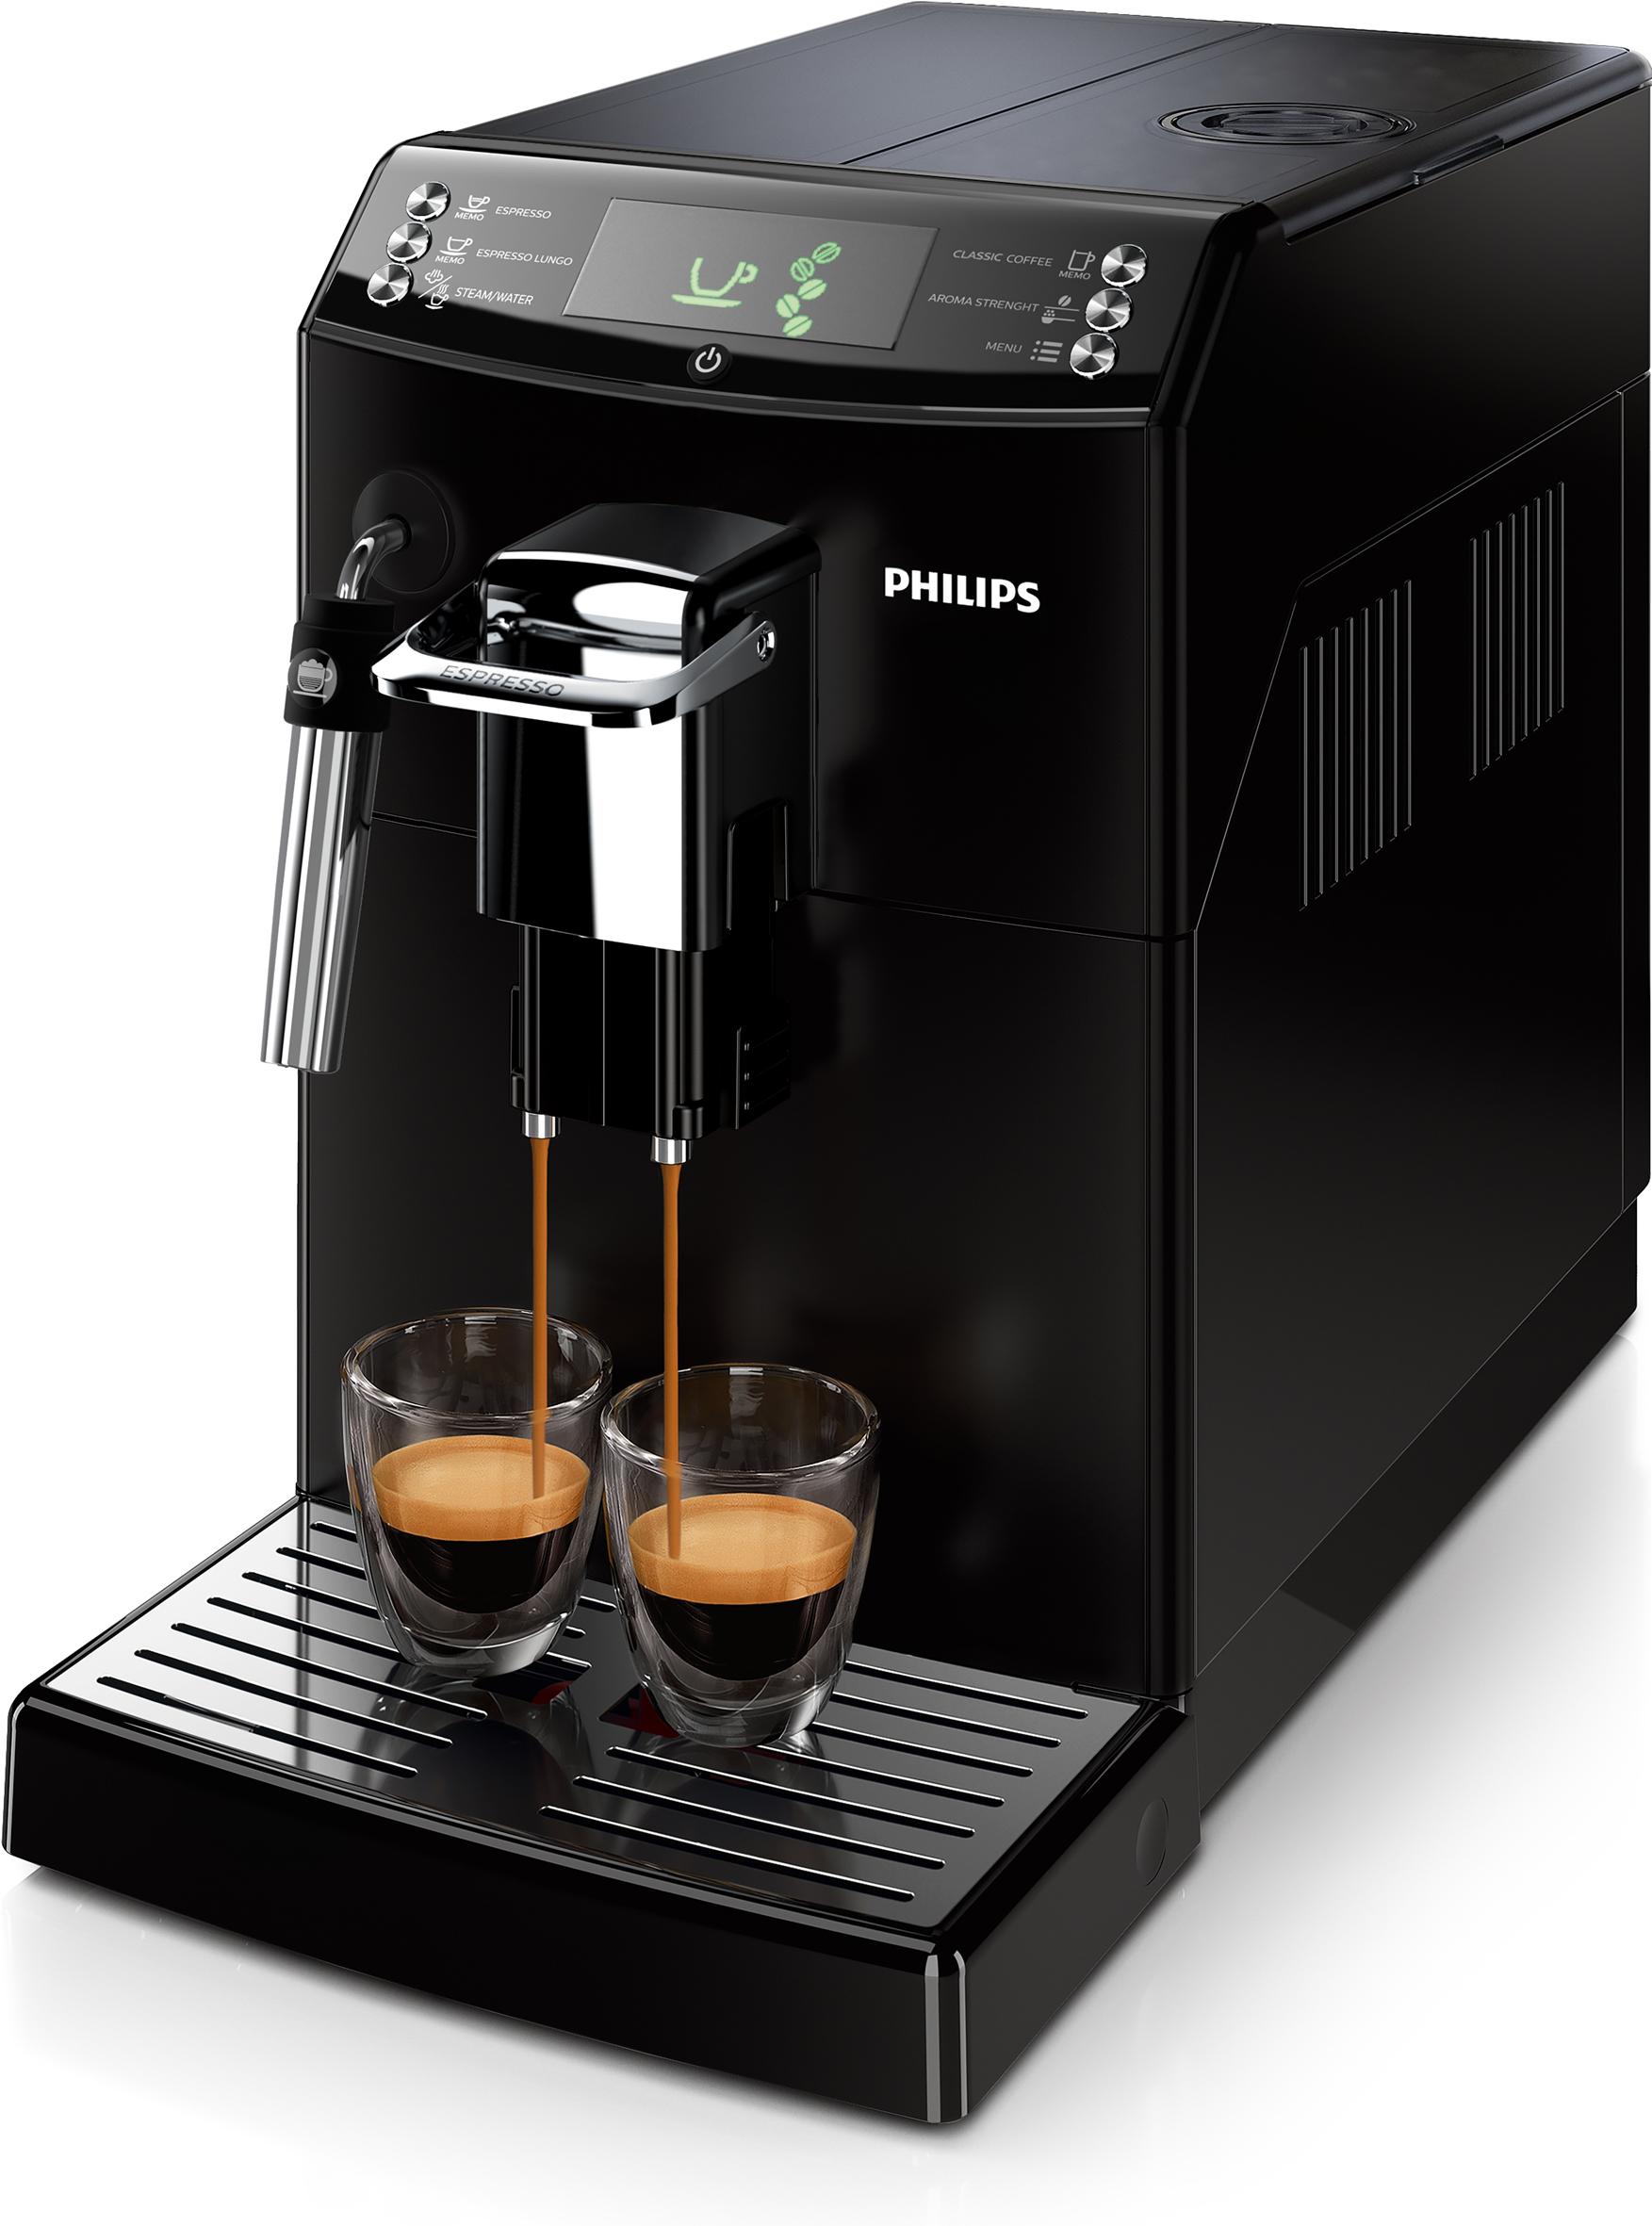 philips kaffeemaschine serie 4000 hd8841 01 mit panarello. Black Bedroom Furniture Sets. Home Design Ideas